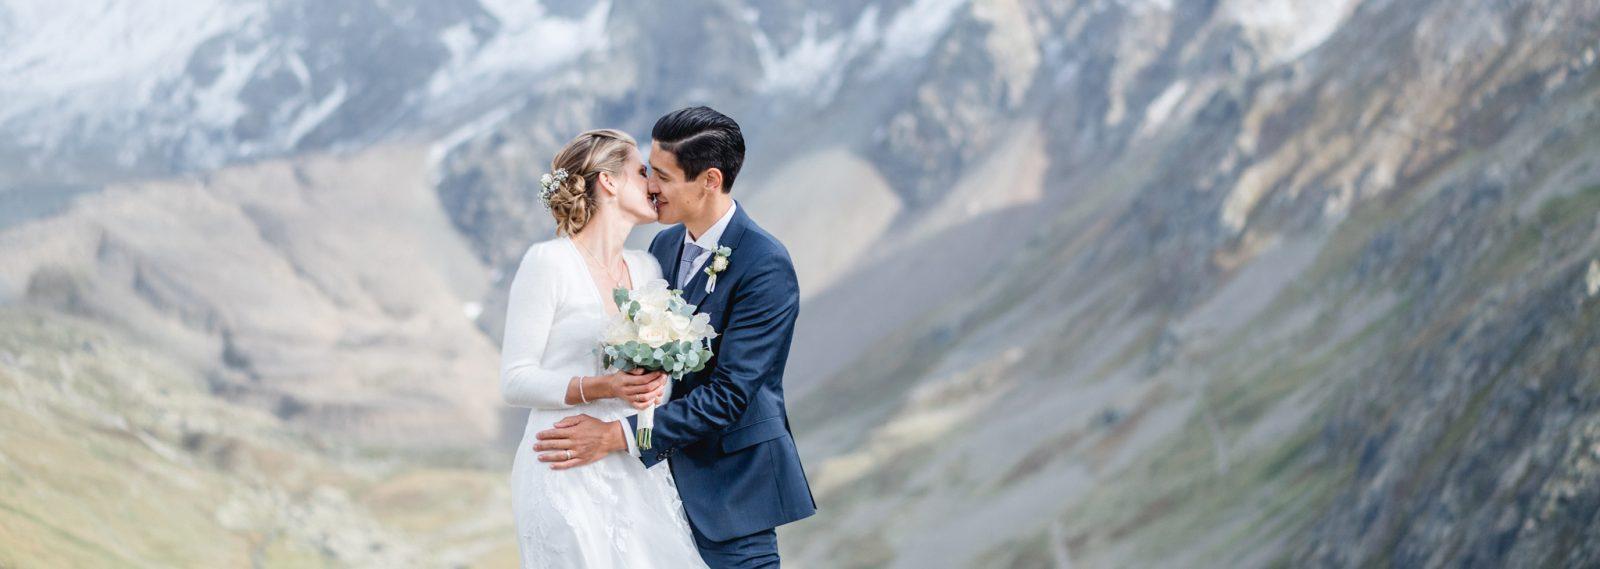 Hochzeitsfotografin-Engadin, Pontresina, Muotas Muragl, St. Moritz, Tessin, Zermatt, Luzern, Bern, Nina-Wüthrich-Photography